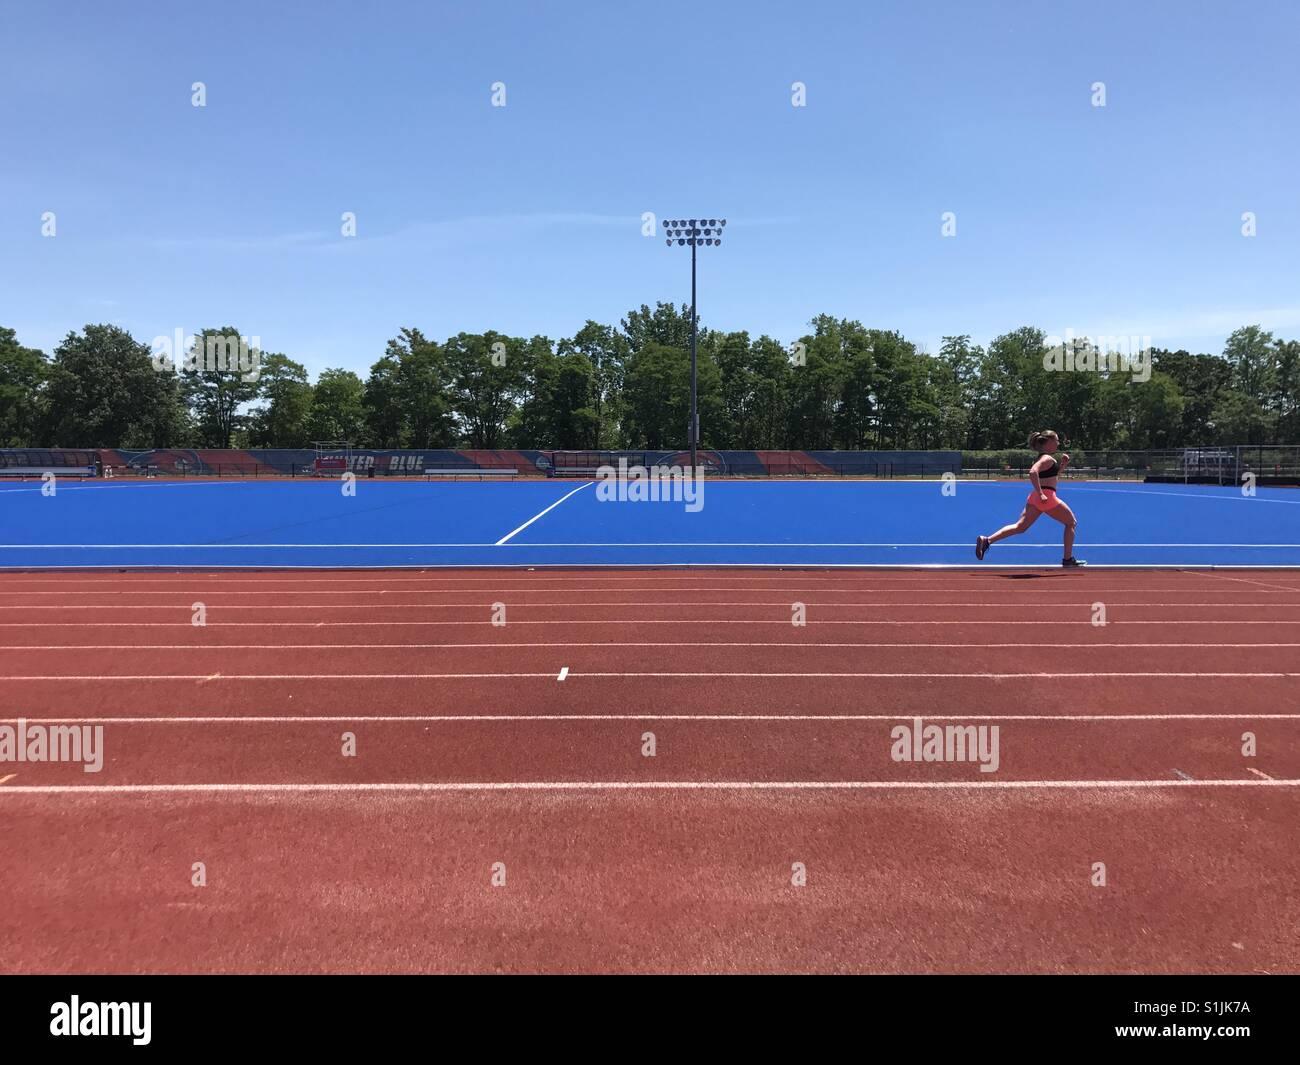 Running on UMass Lowell track - Stock Image